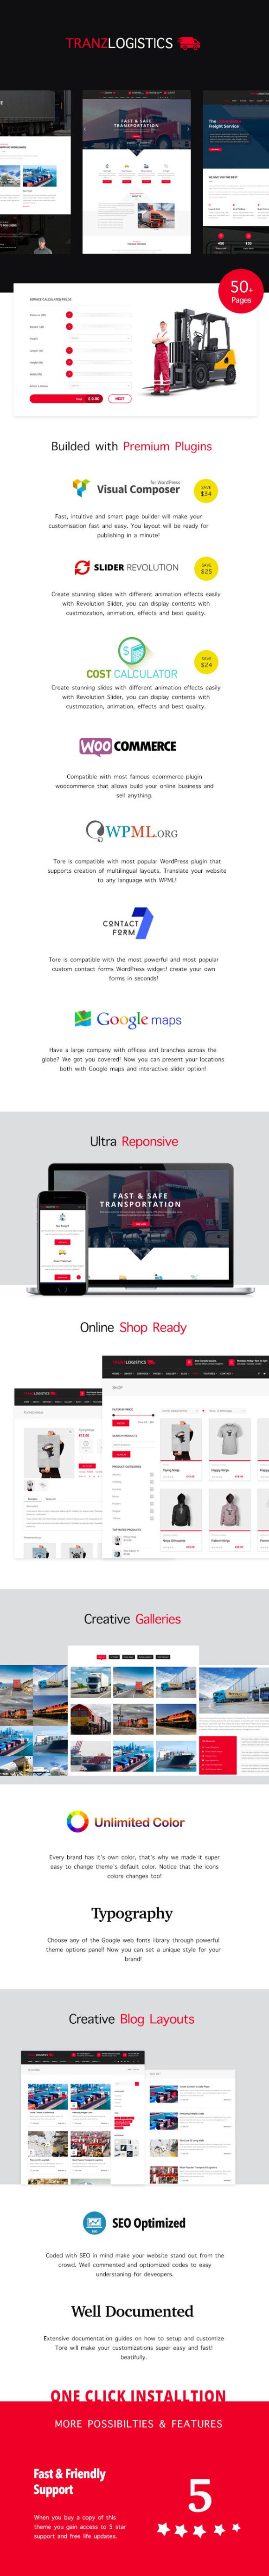 Tranzlogistics - Logistics & Cargo Shipping WordPress Theme - 1